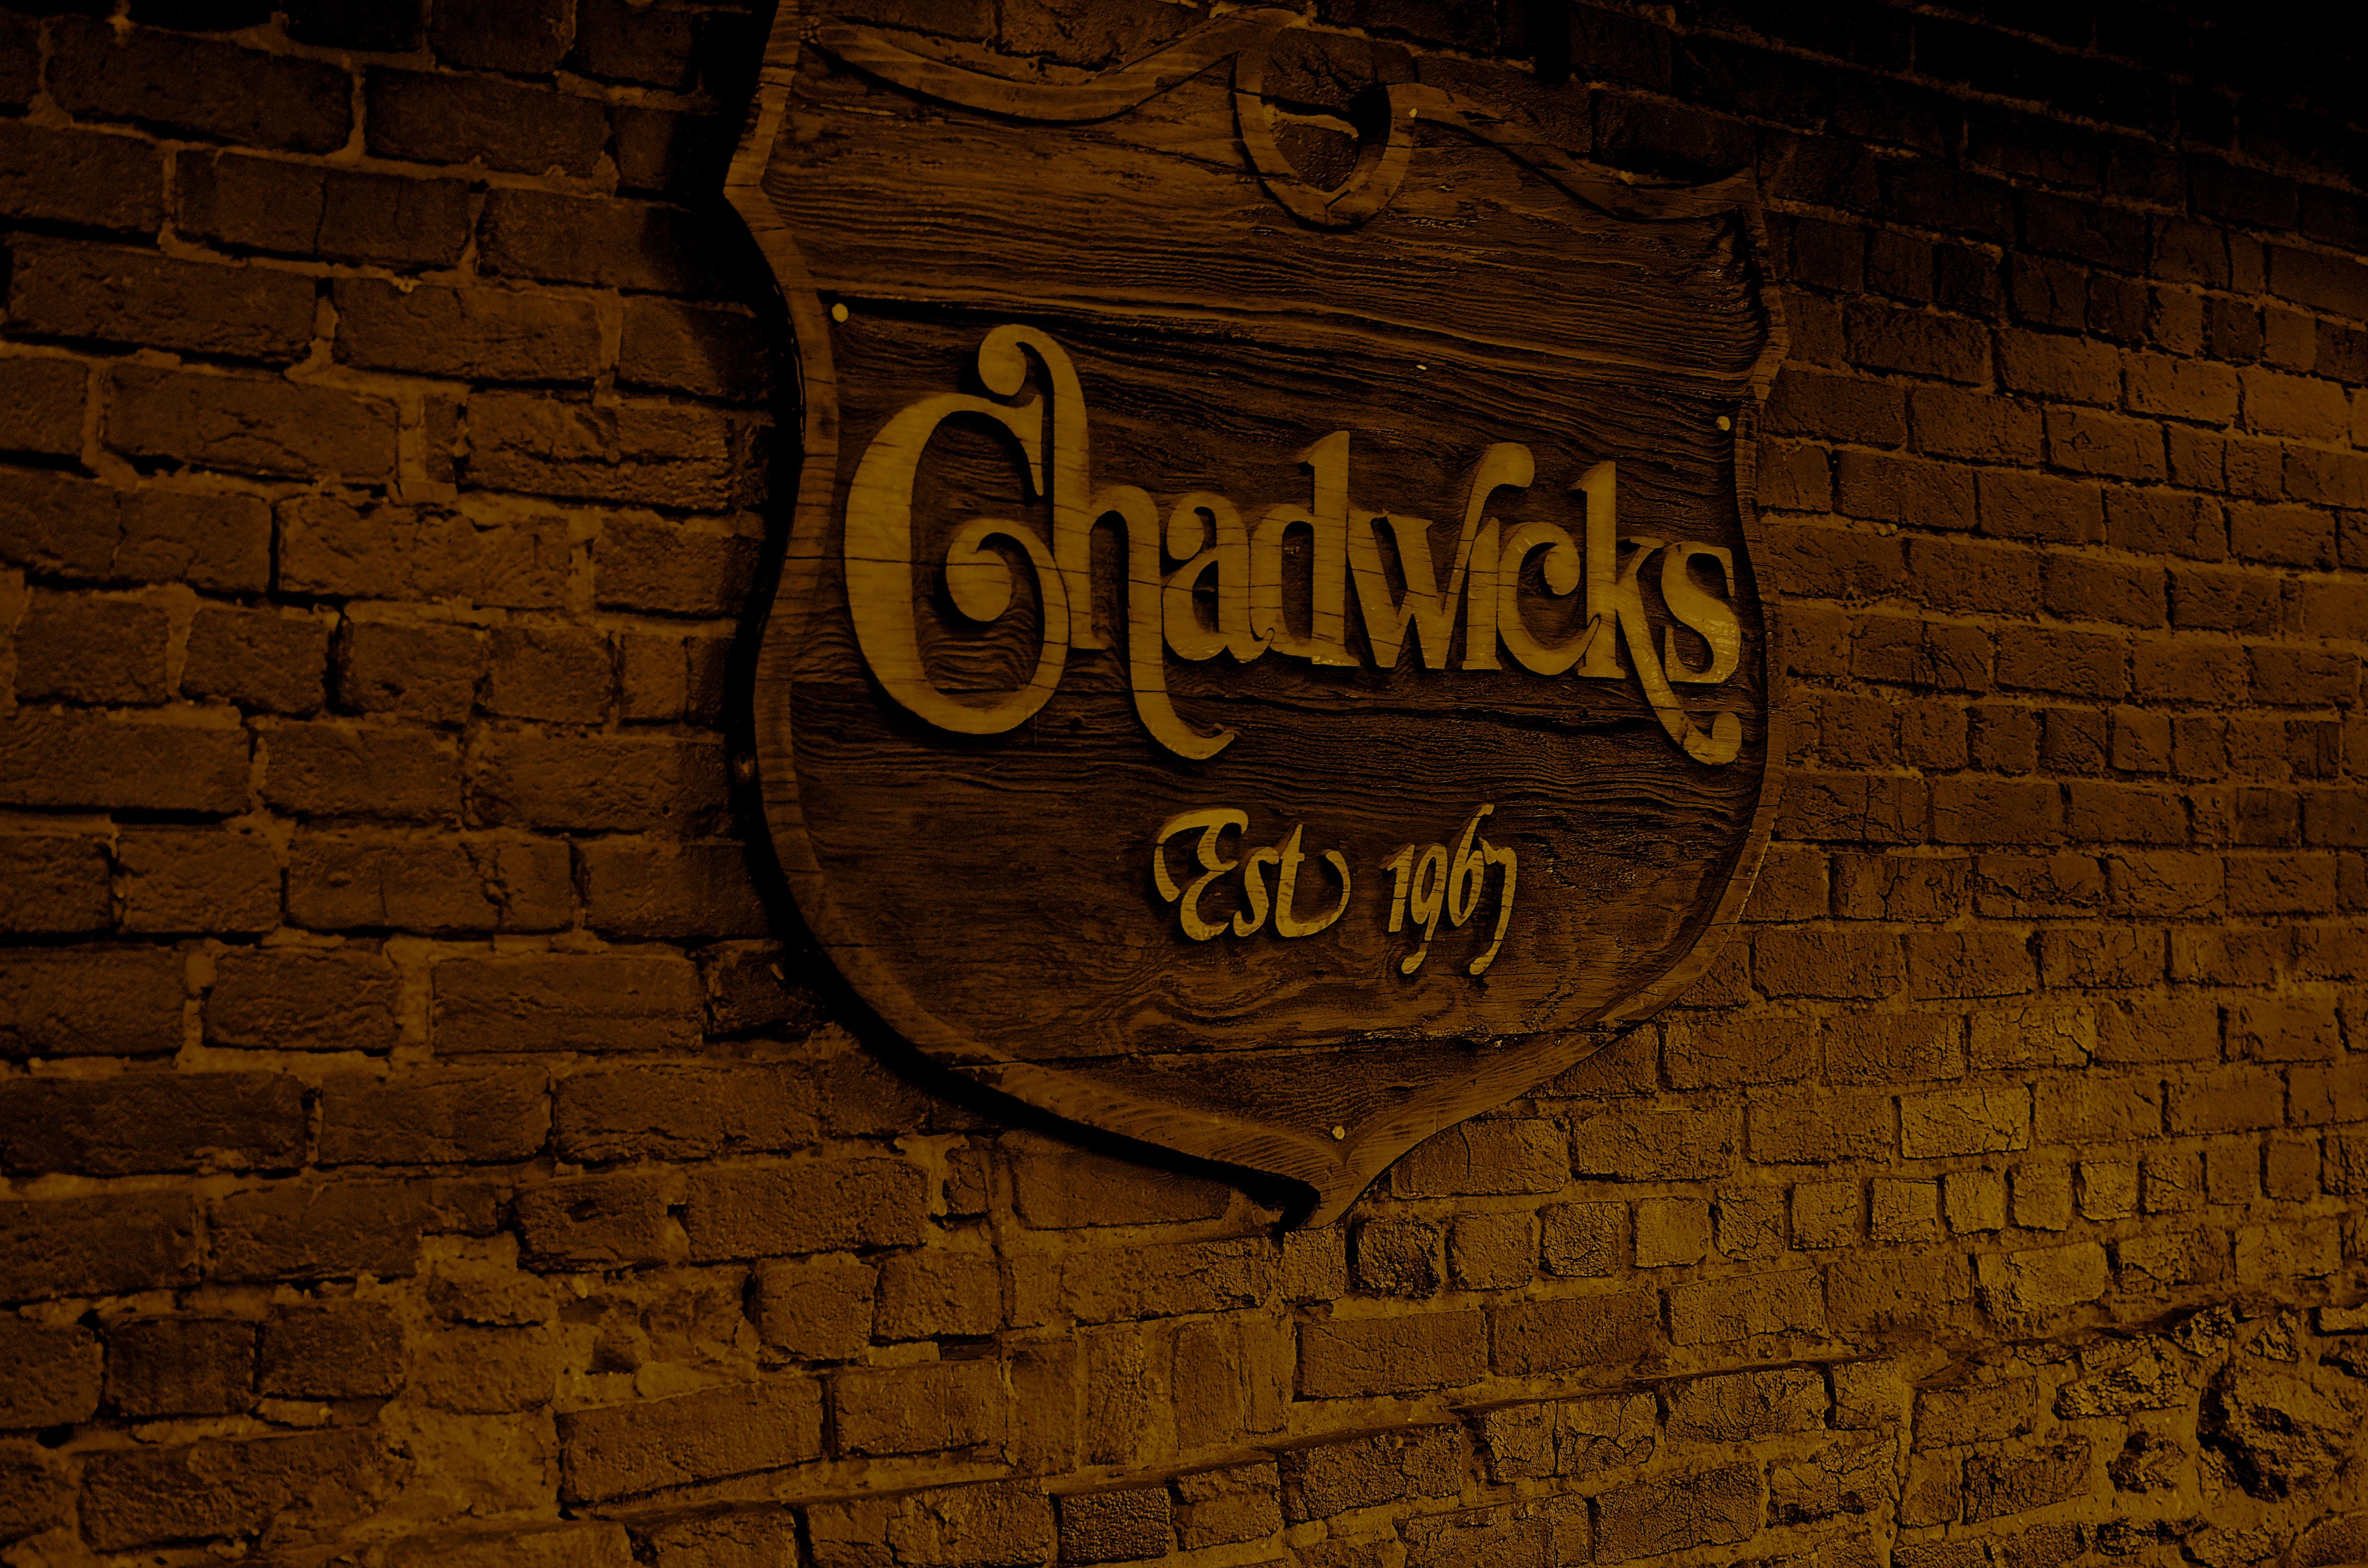 Farewell Chadwick's